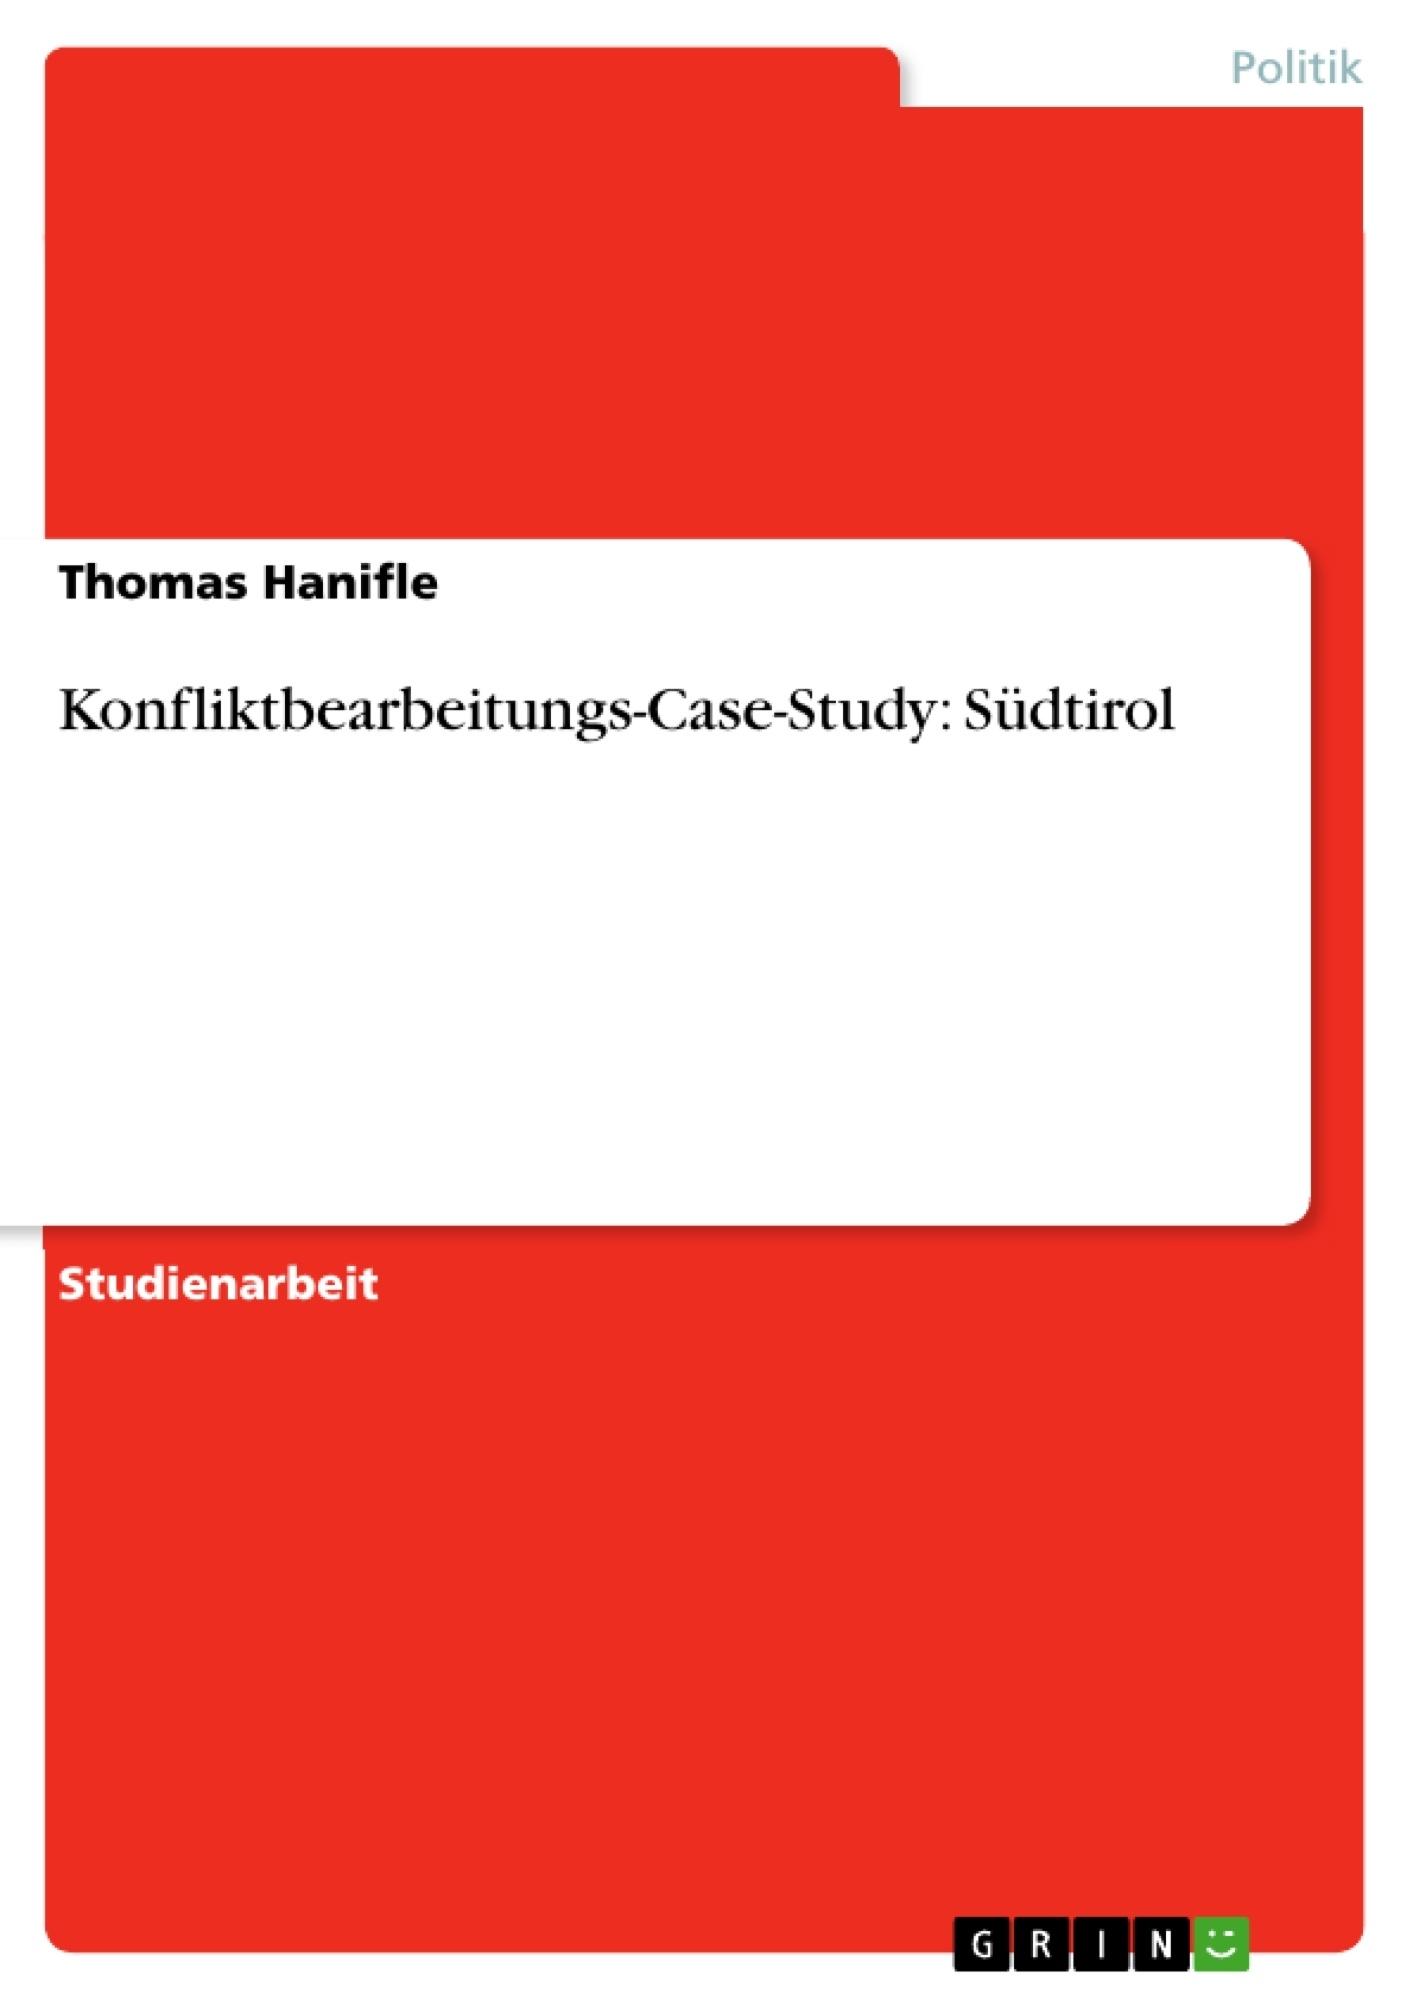 Titel: Konfliktbearbeitungs-Case-Study: Südtirol